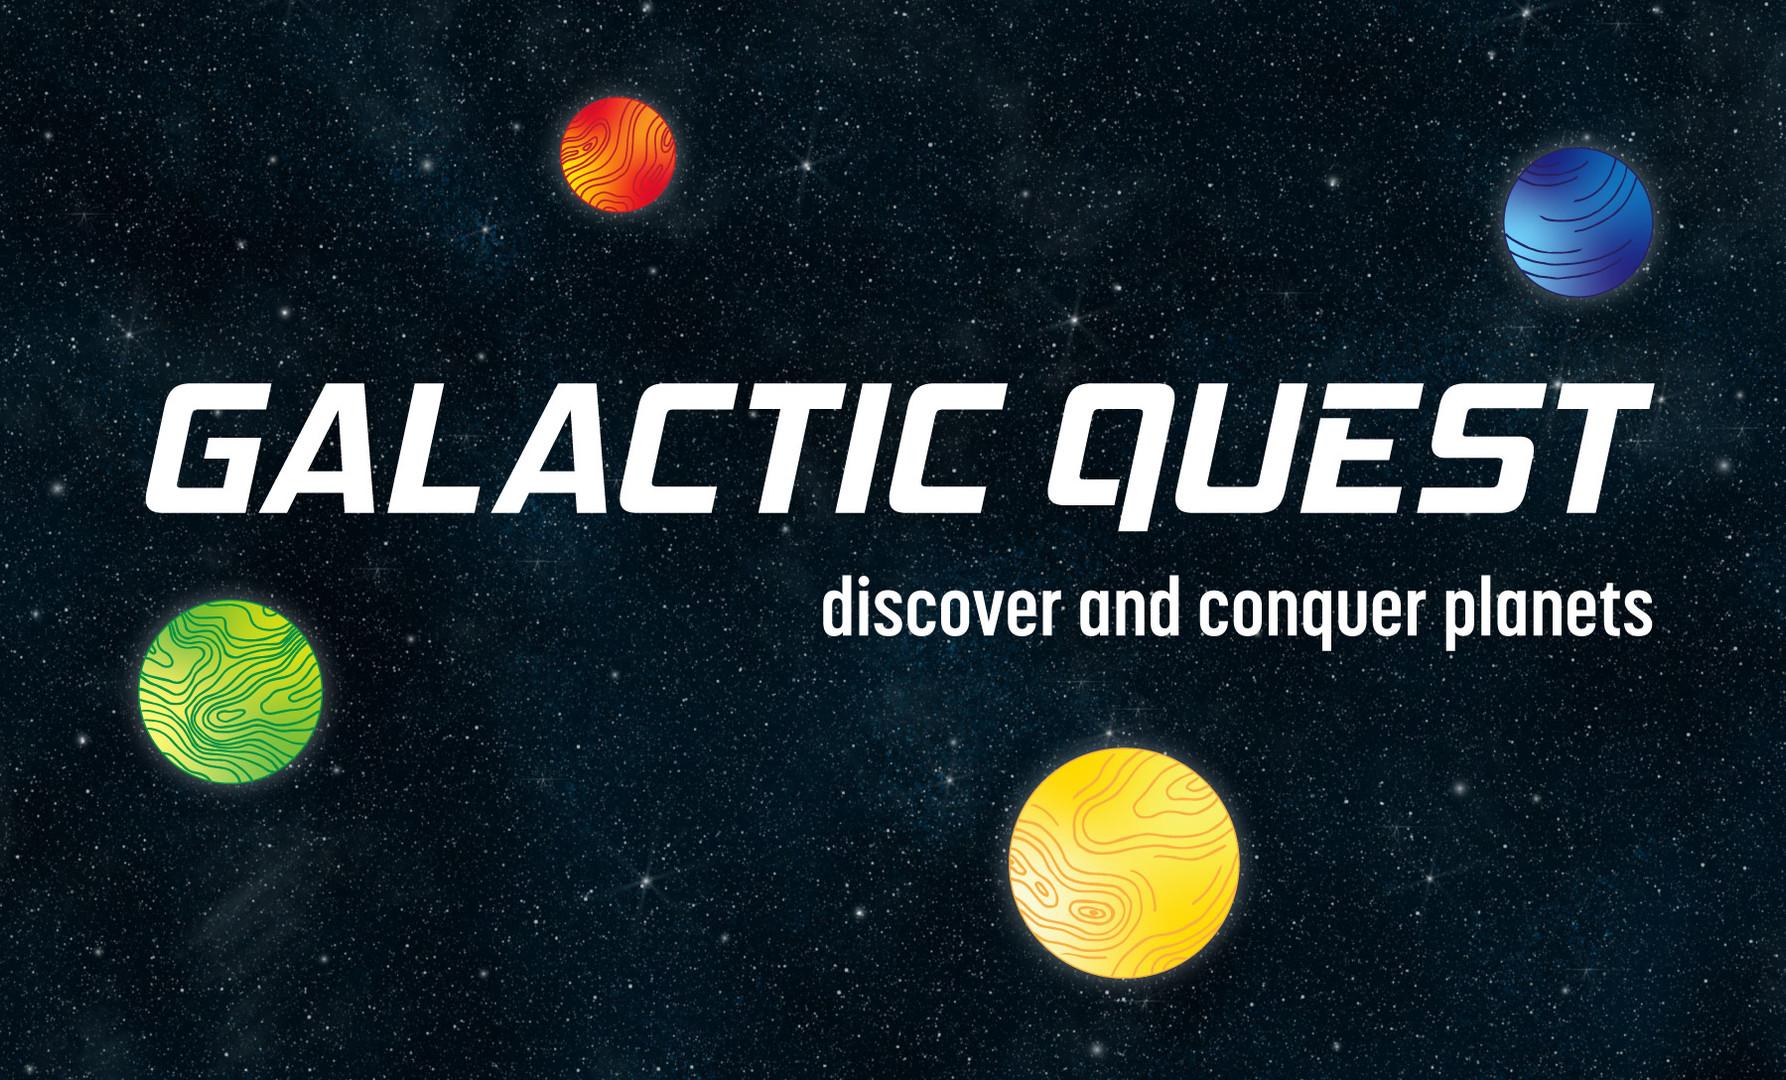 Galactic Quest Branding Elements